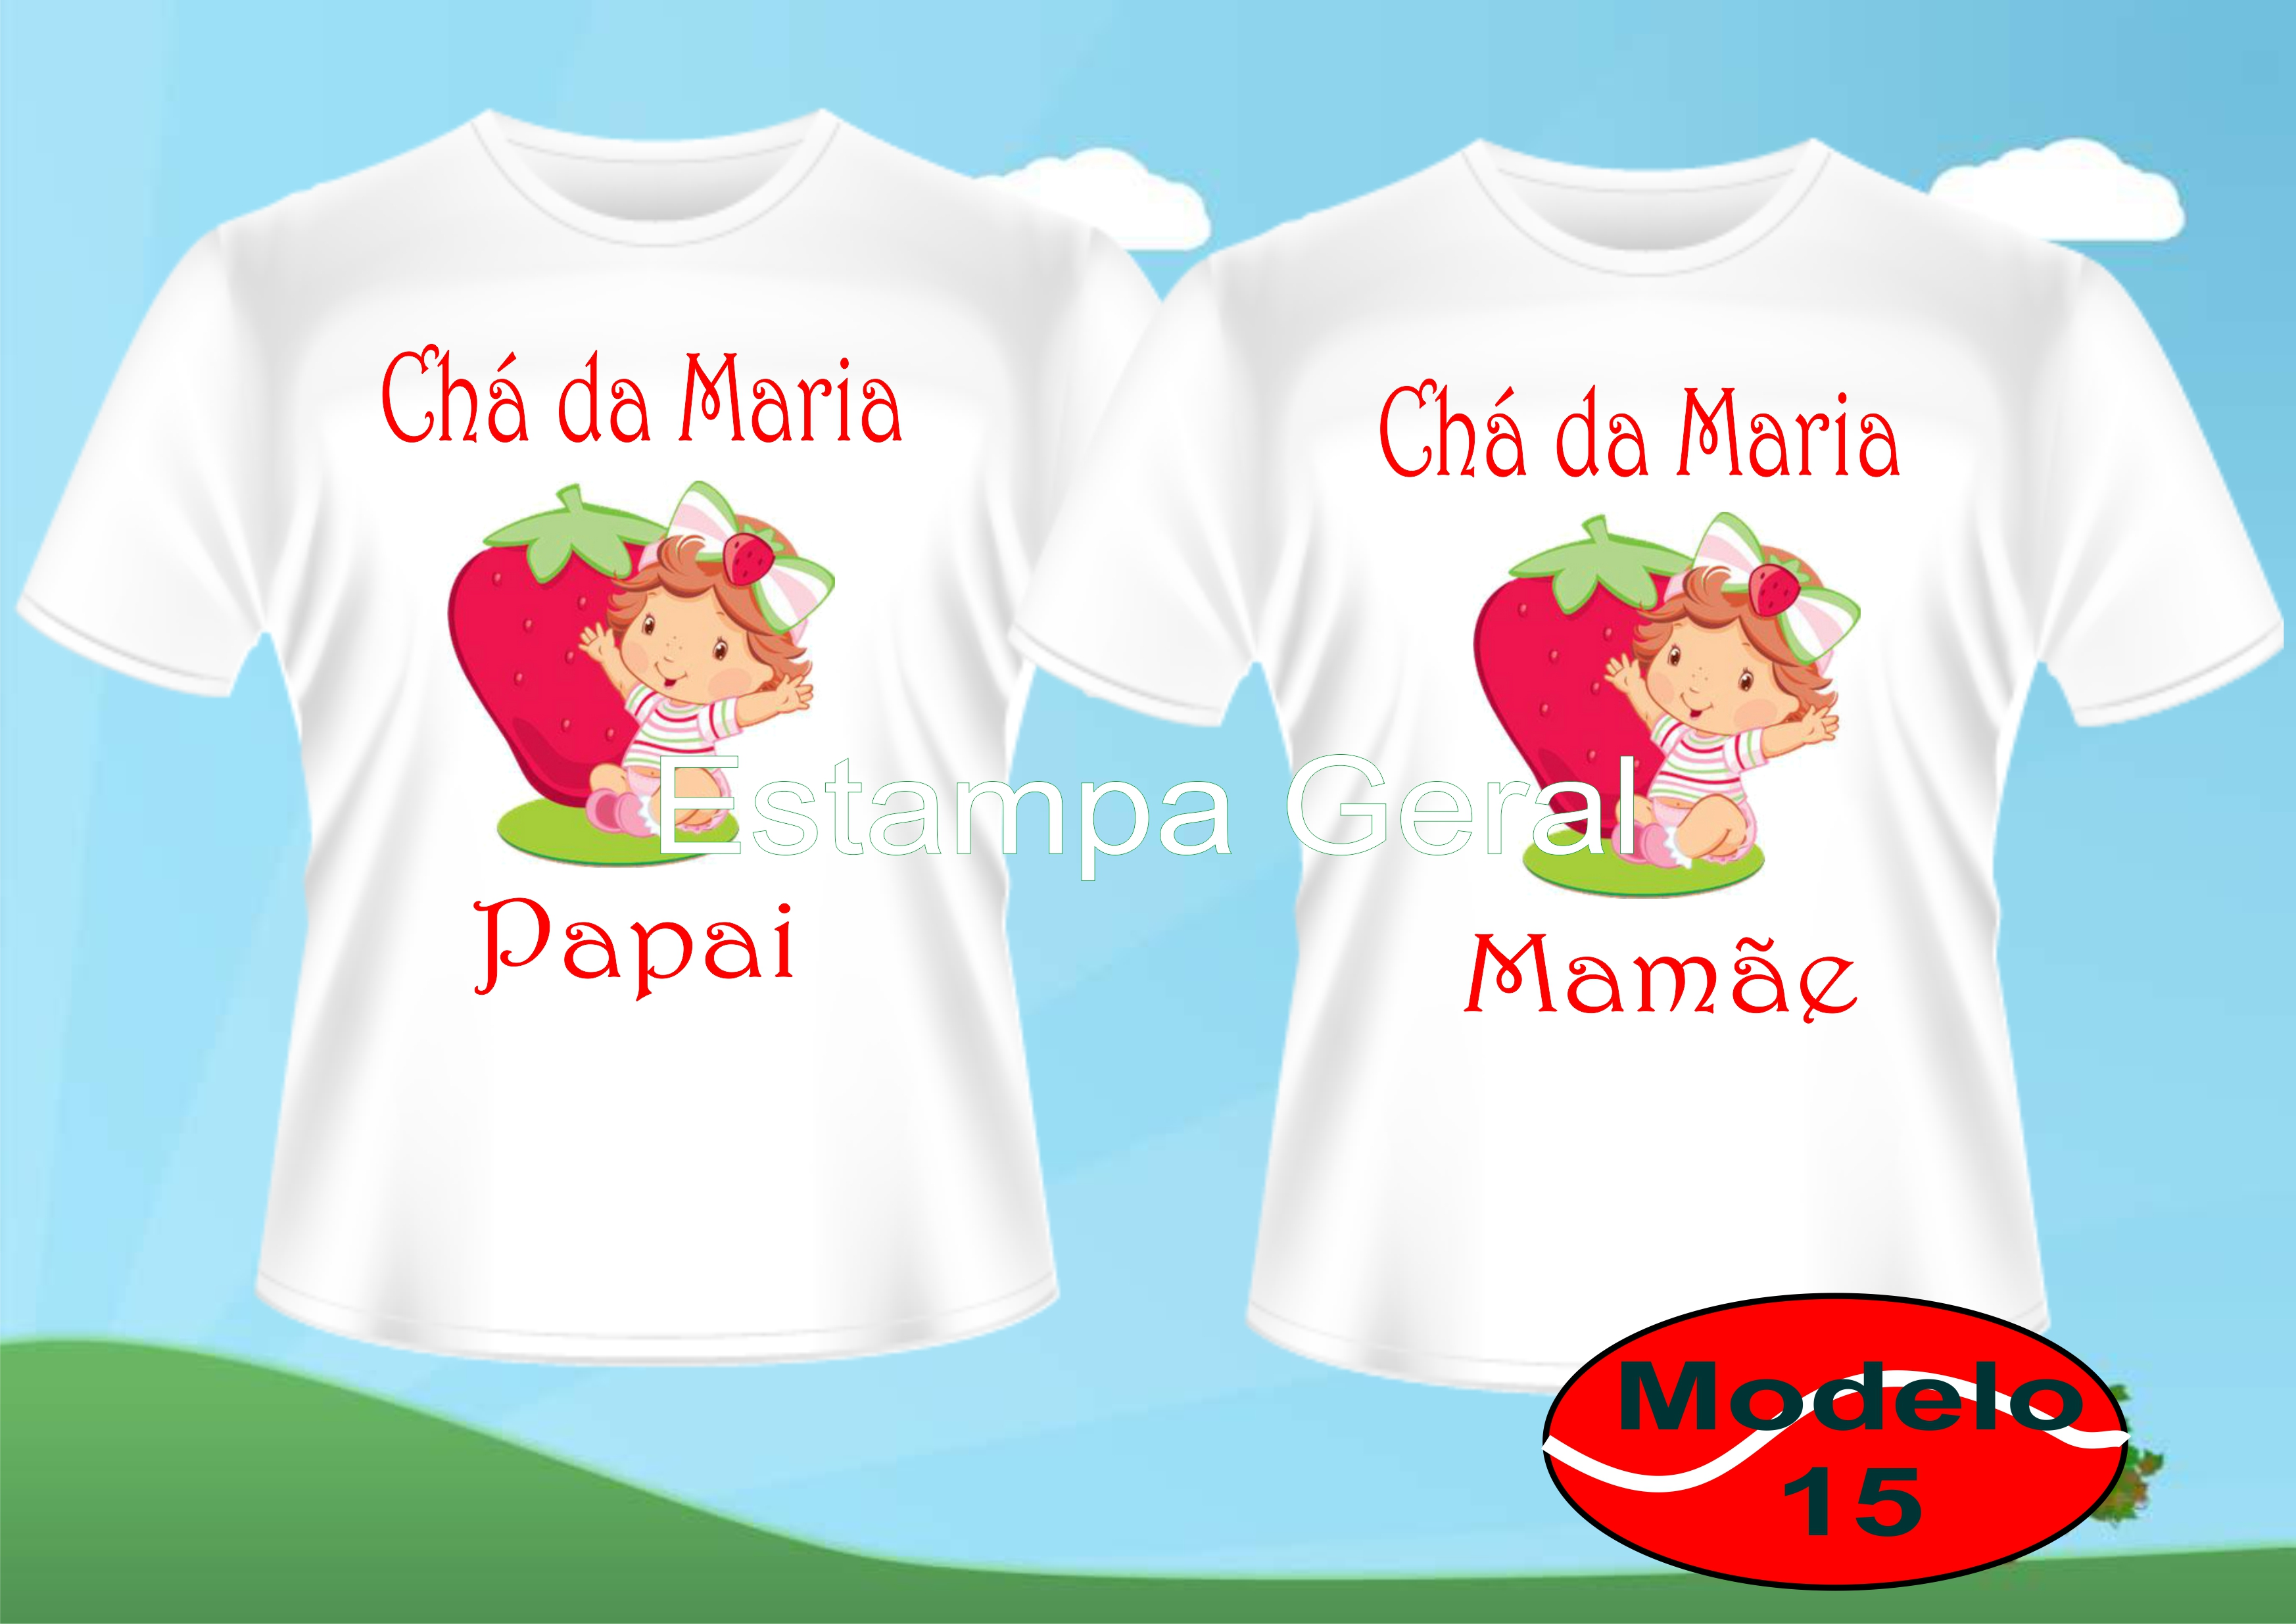 Camisetas Personalizadas Gestante  d8425c5ada3